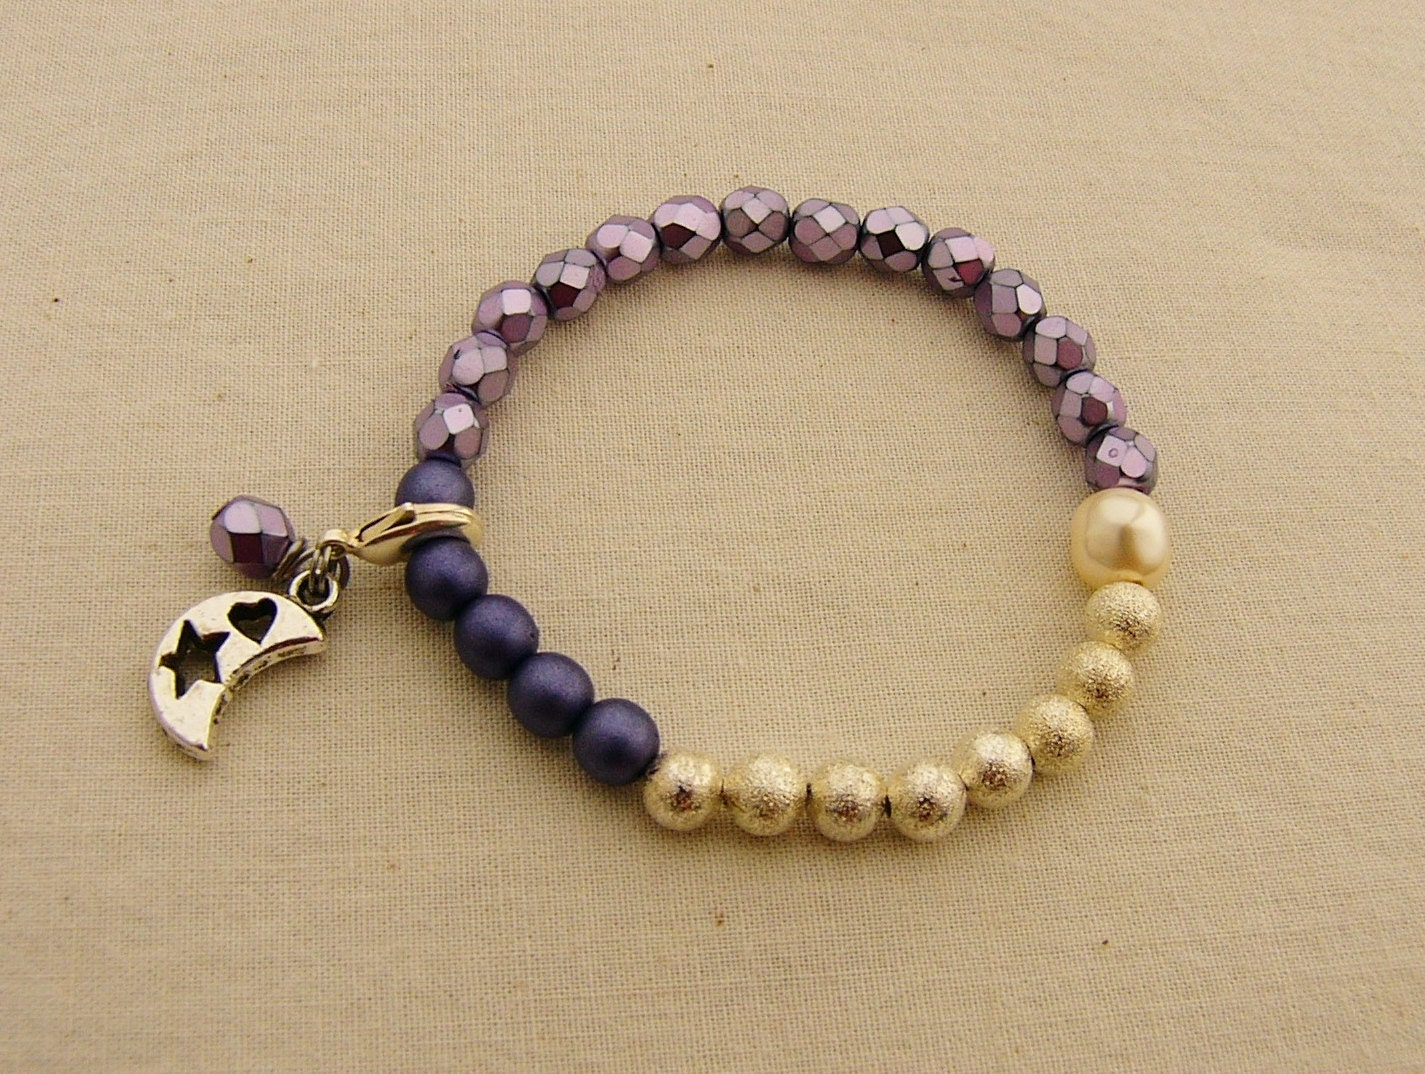 Period Tracking Bracelet Selene Beads BraceletTween Jewelry